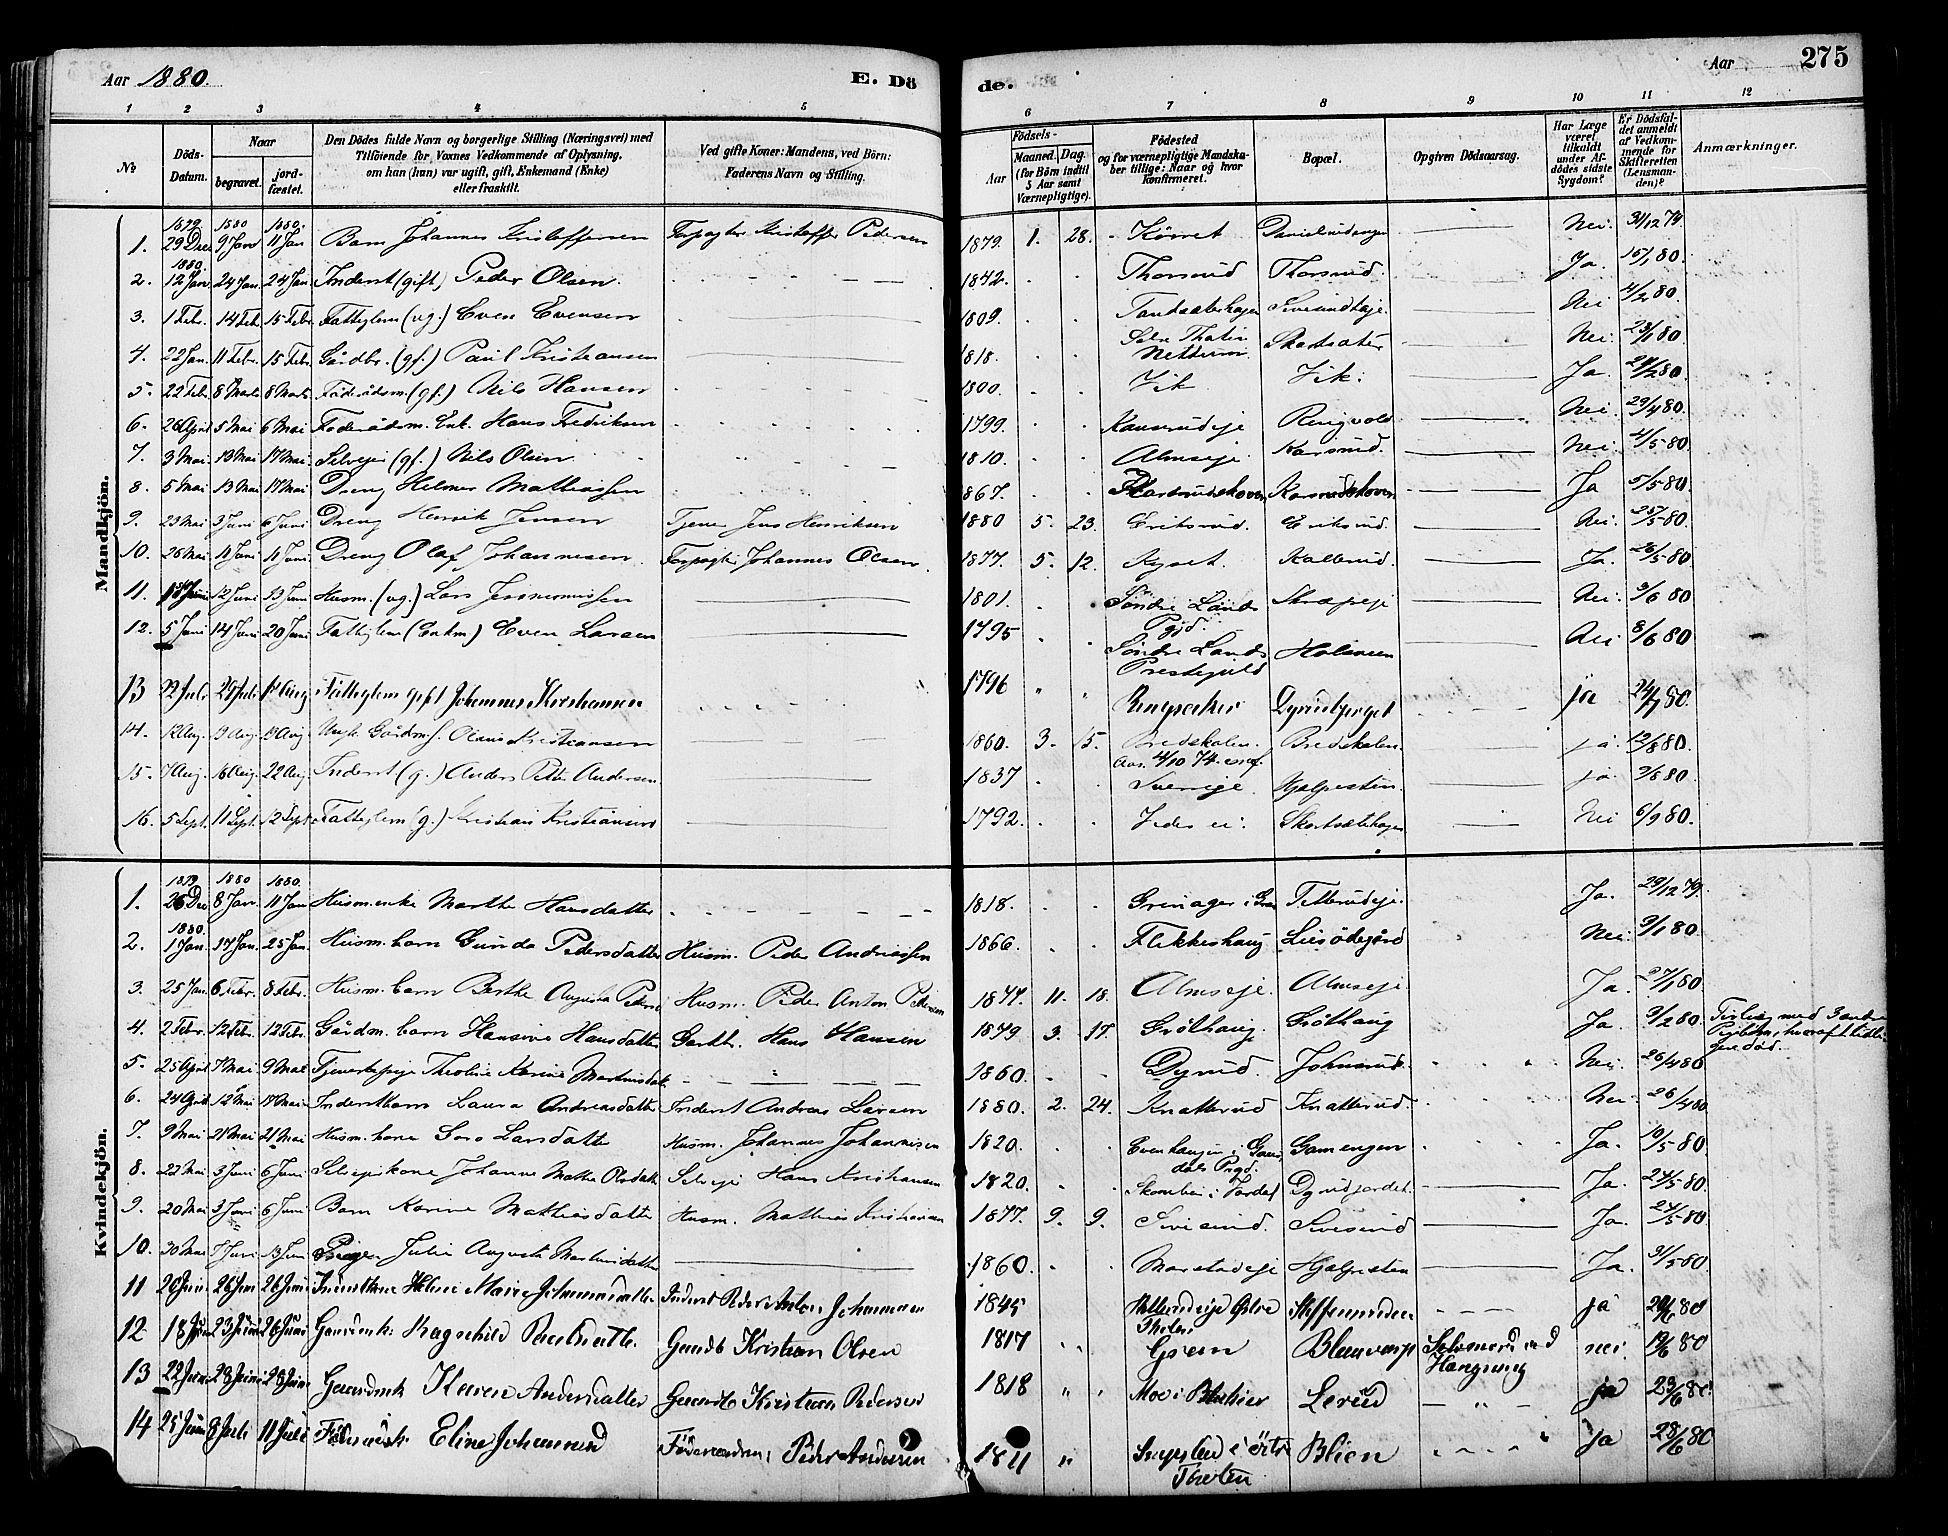 SAH, Vestre Toten prestekontor, H/Ha/Haa/L0009: Ministerialbok nr. 9, 1878-1894, s. 275